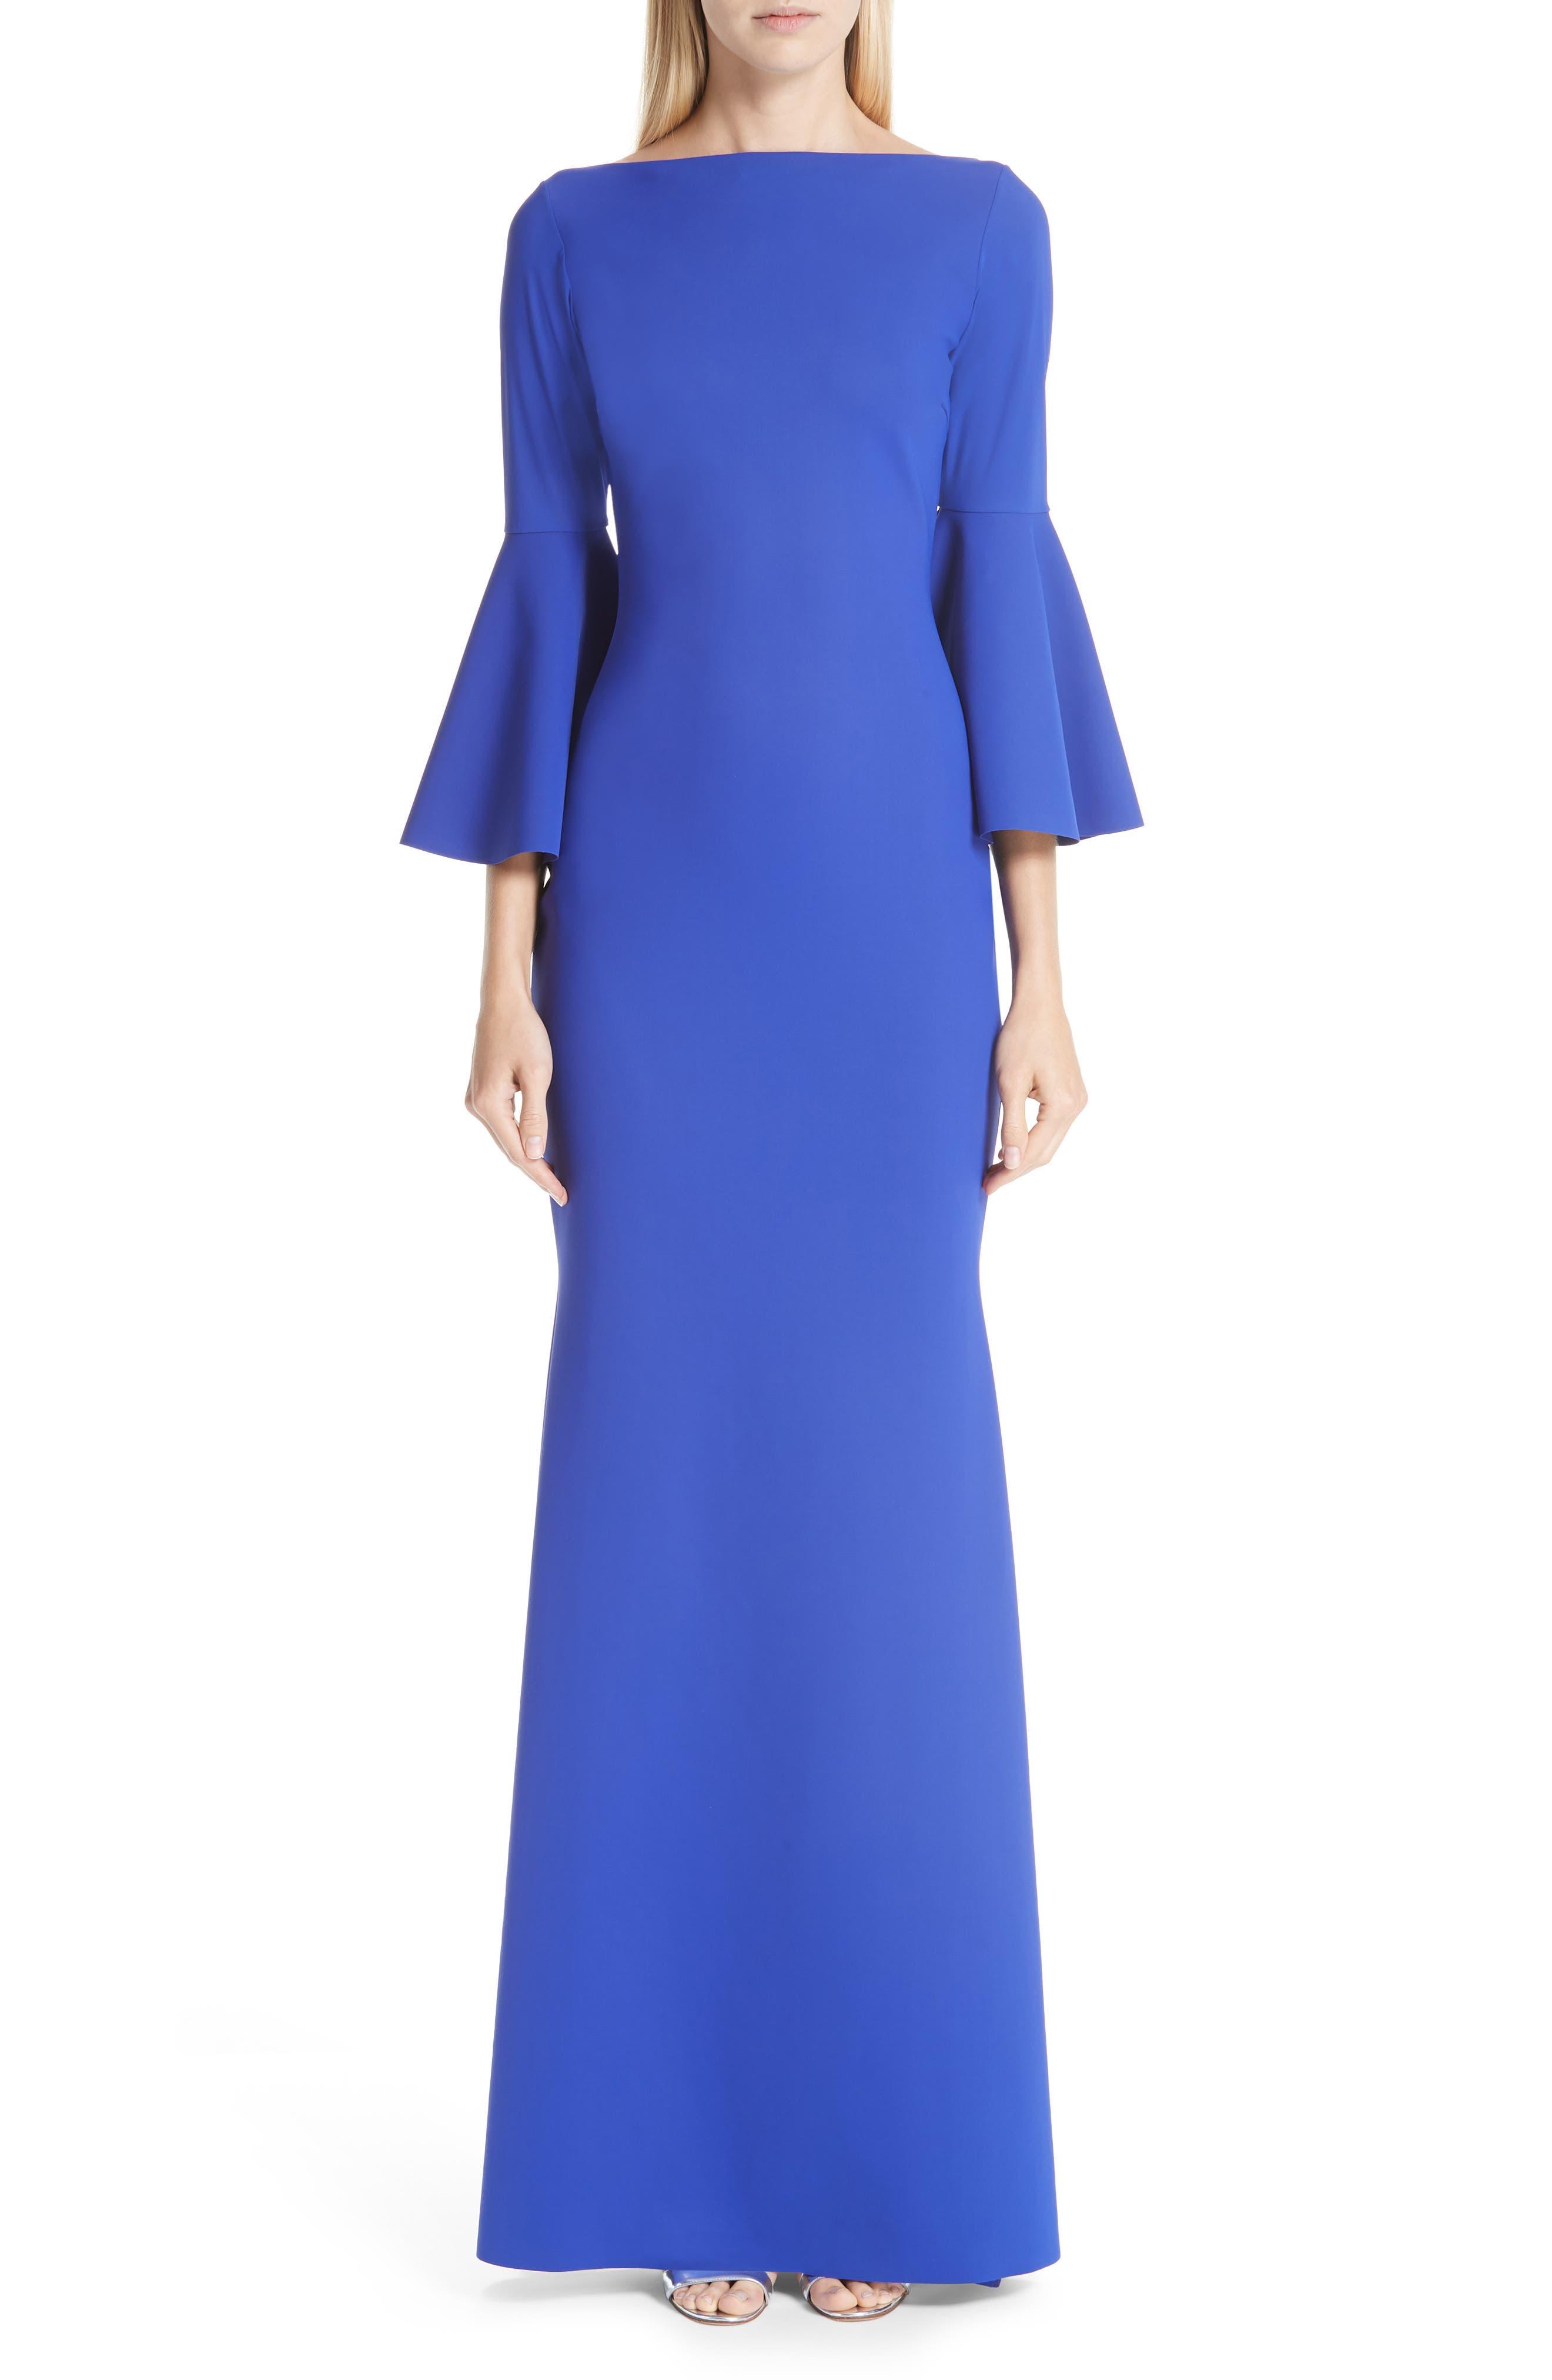 CHIARA BONI LA PETITE ROBE Iva Bell Sleeve Evening Dress, Main, color, INCHIOSTRO